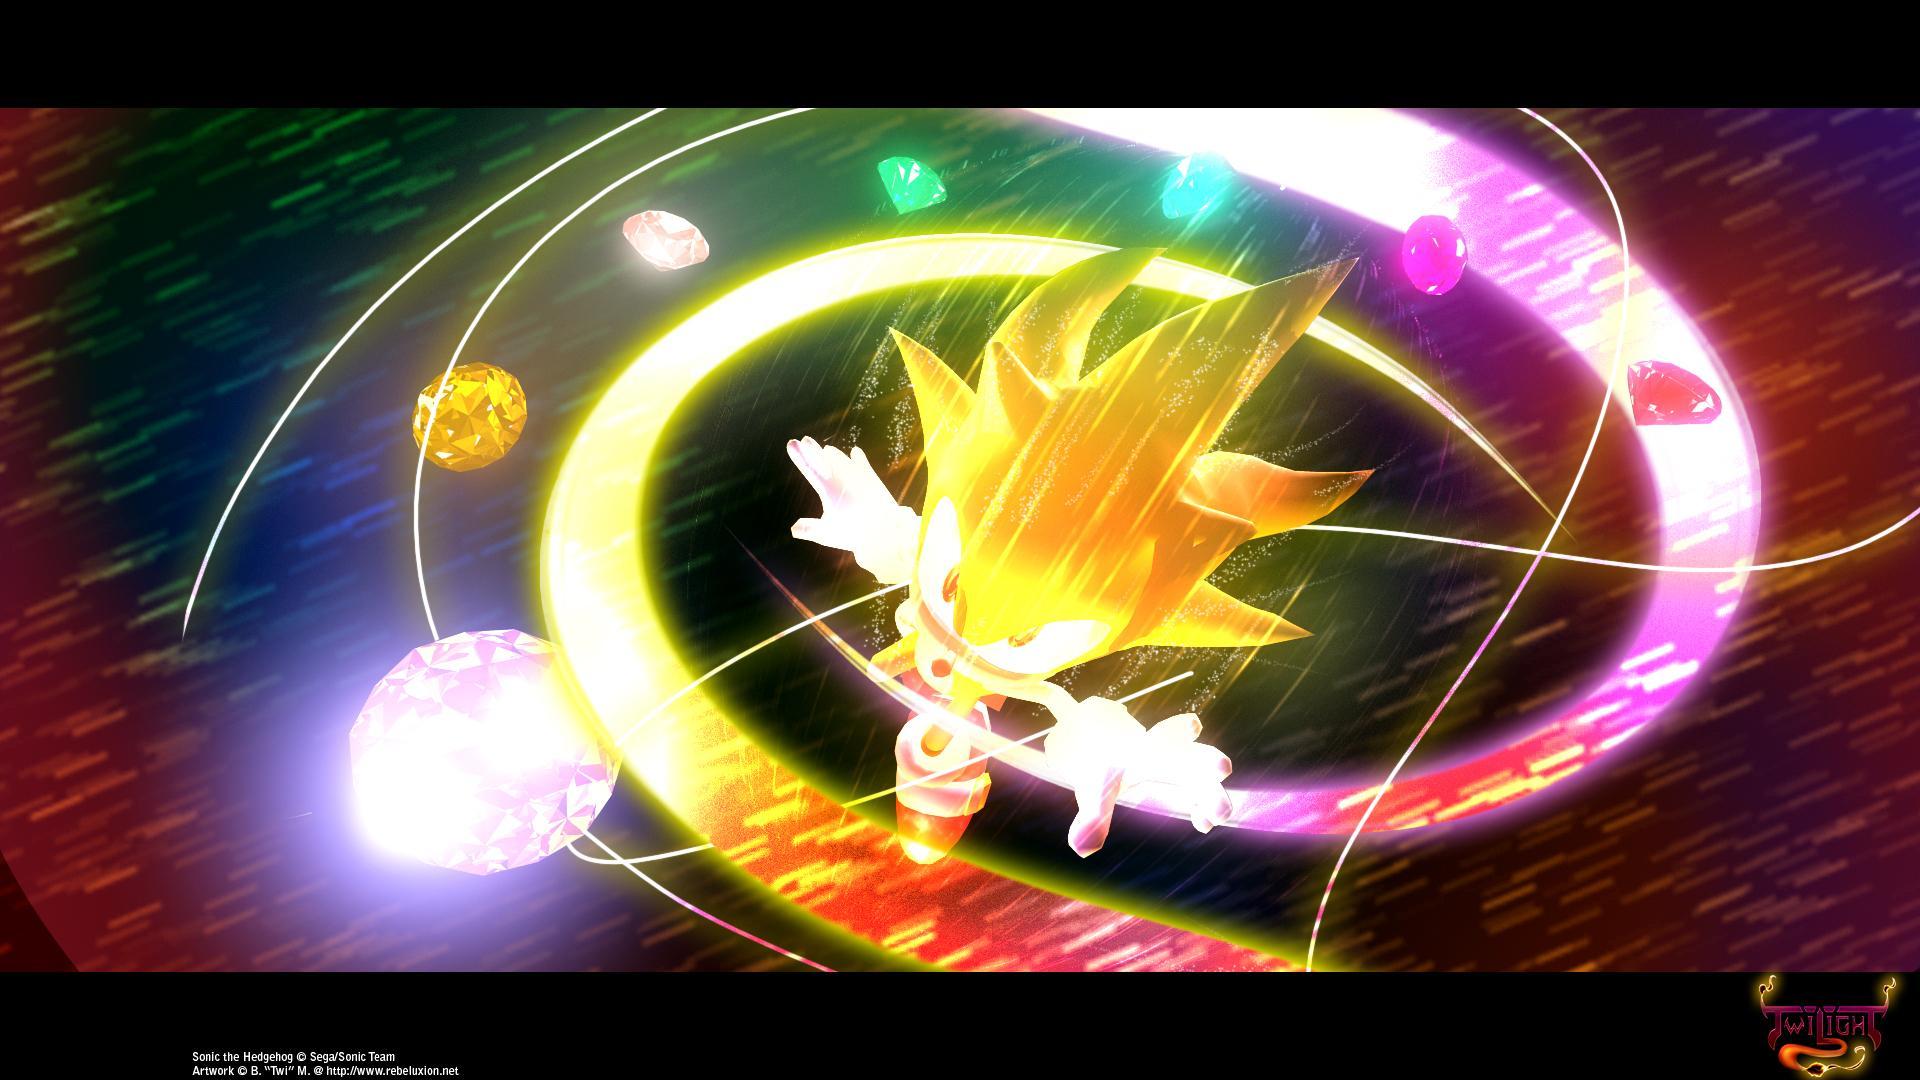 Sonic the hedgehog wallpaper zerochan anime image board - Super sonic wallpaper free download ...